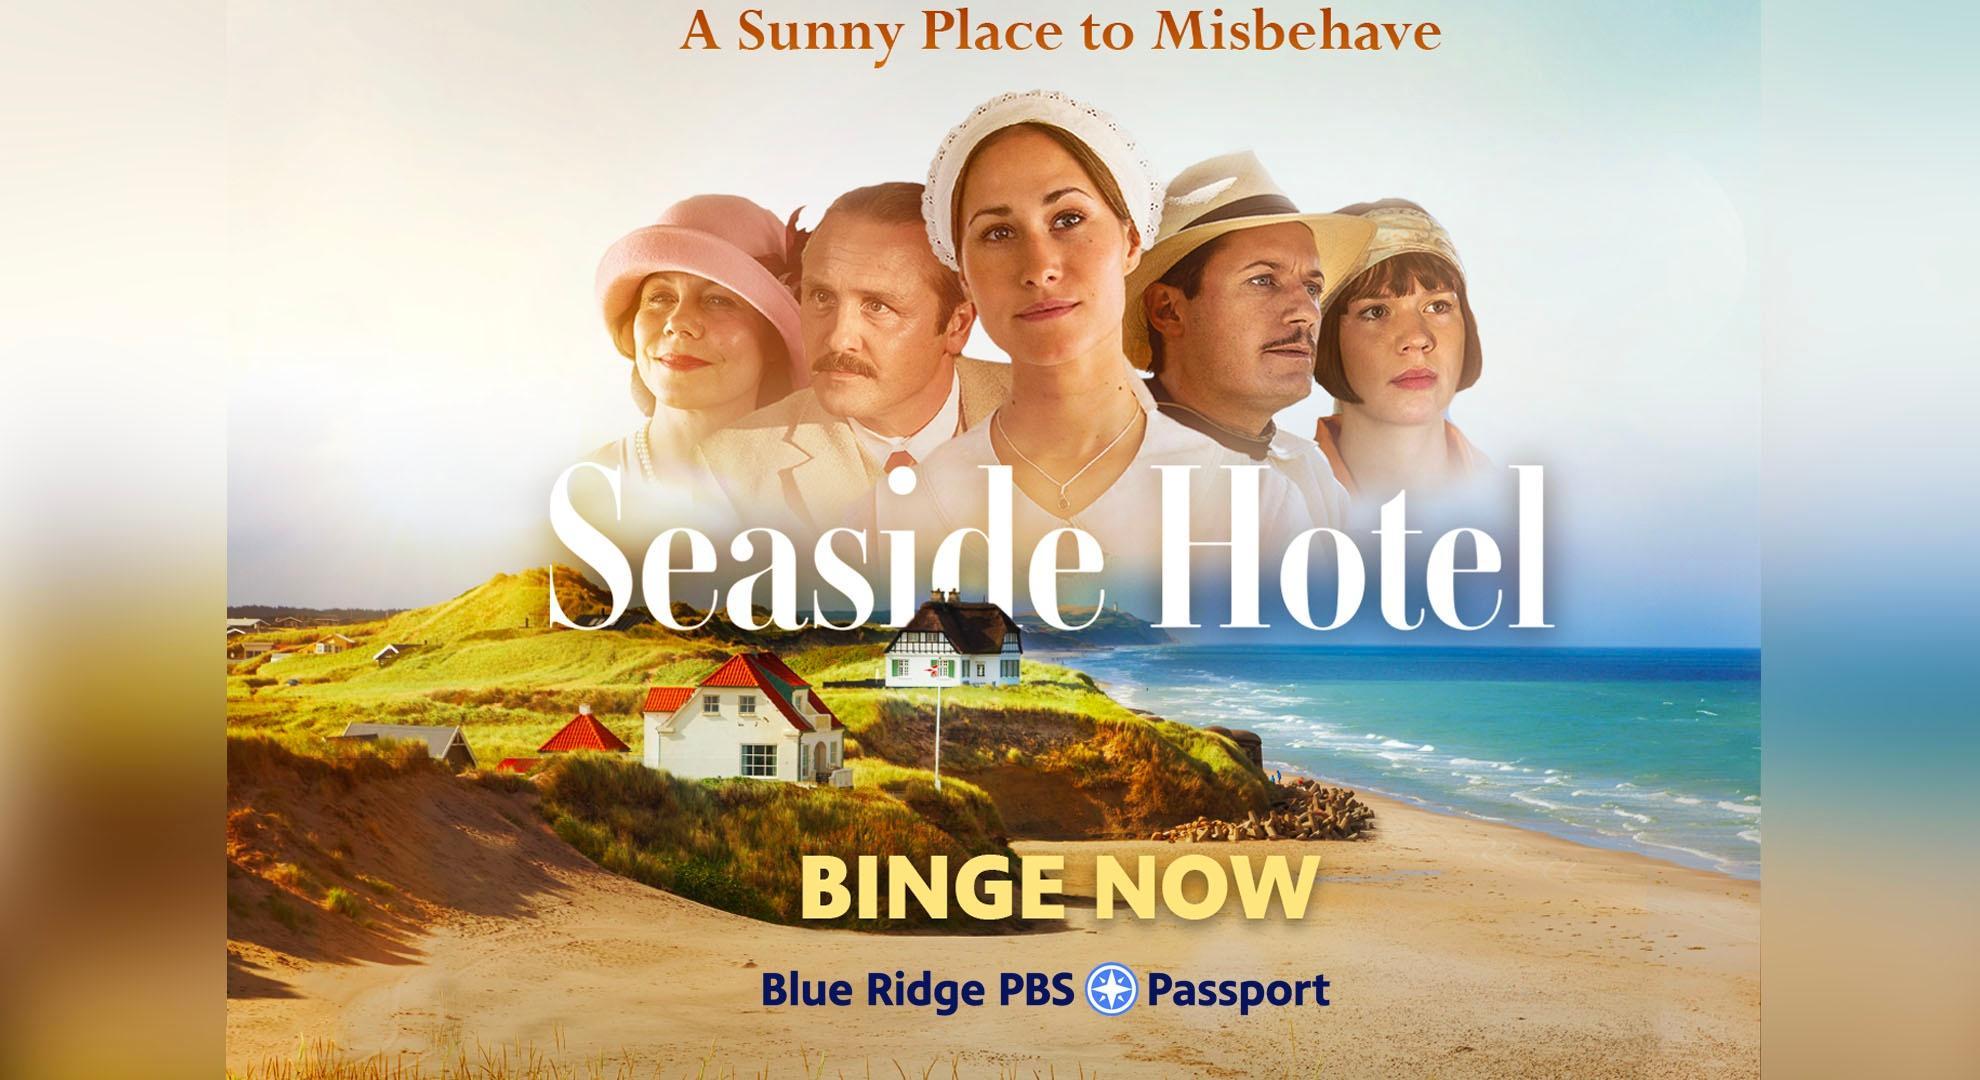 Seaside Hotel  - Binge Now!